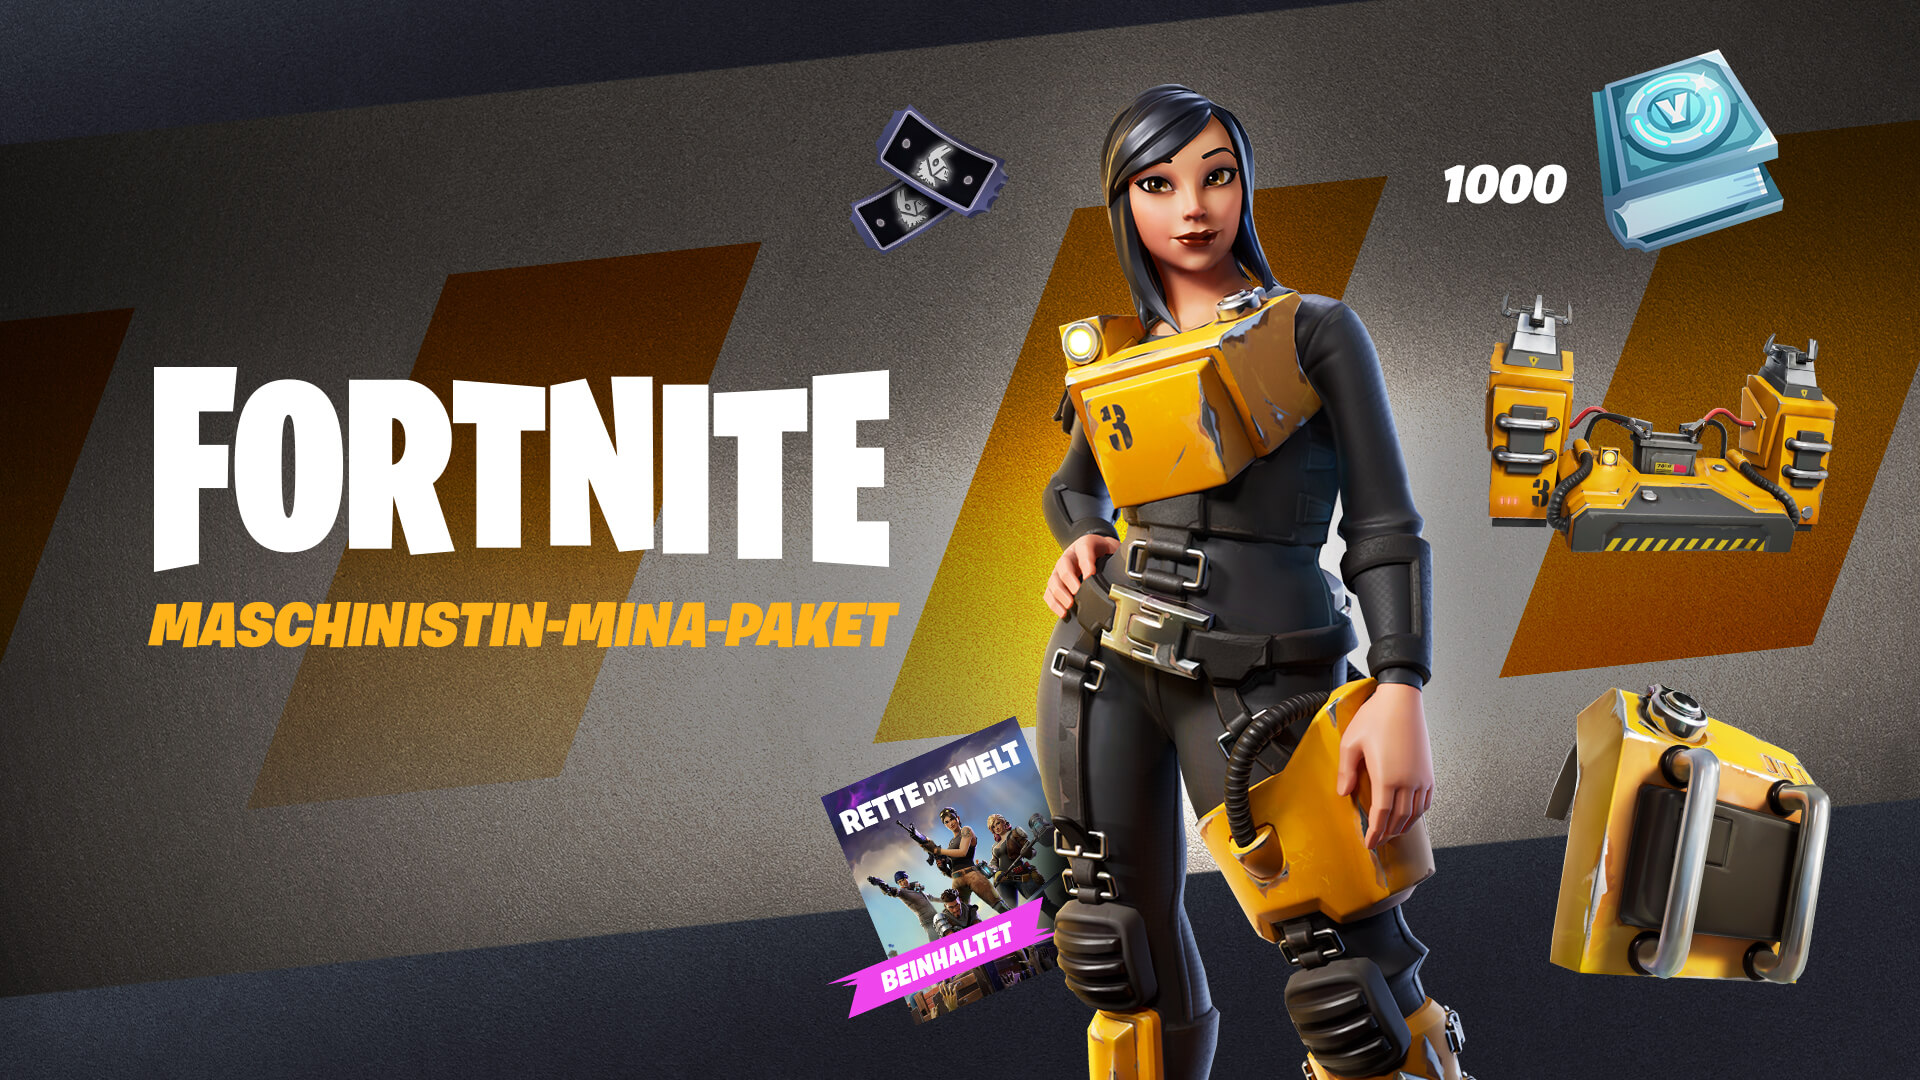 Fortnite Save The World Machinist Mina Pack DE